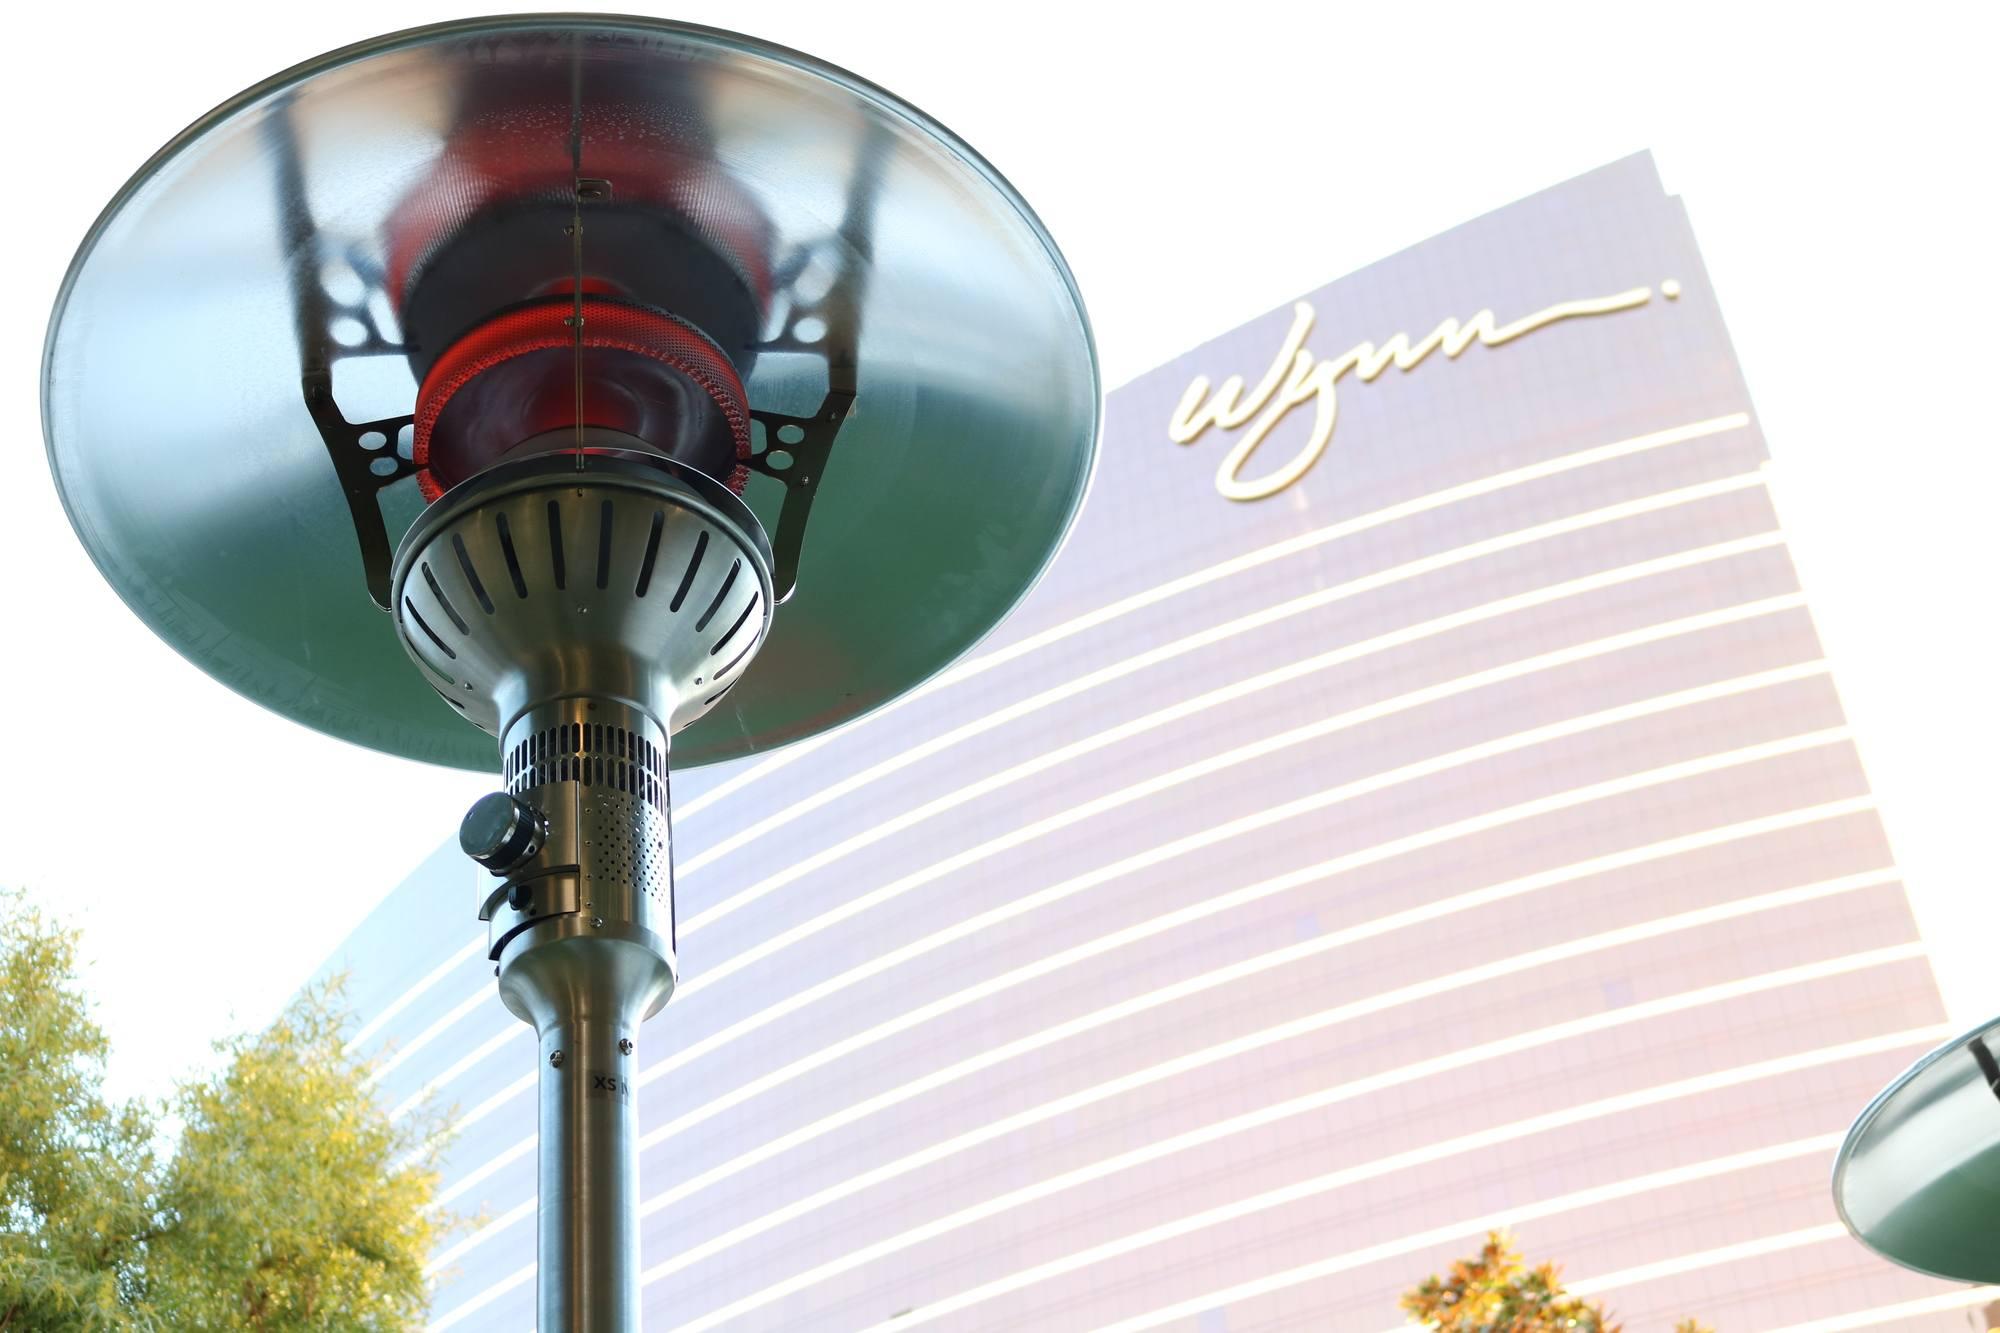 Evenglo Portable Gas Patio Heater Wynn Las Vegas Ir Energy throughout proportions 2000 X 1333